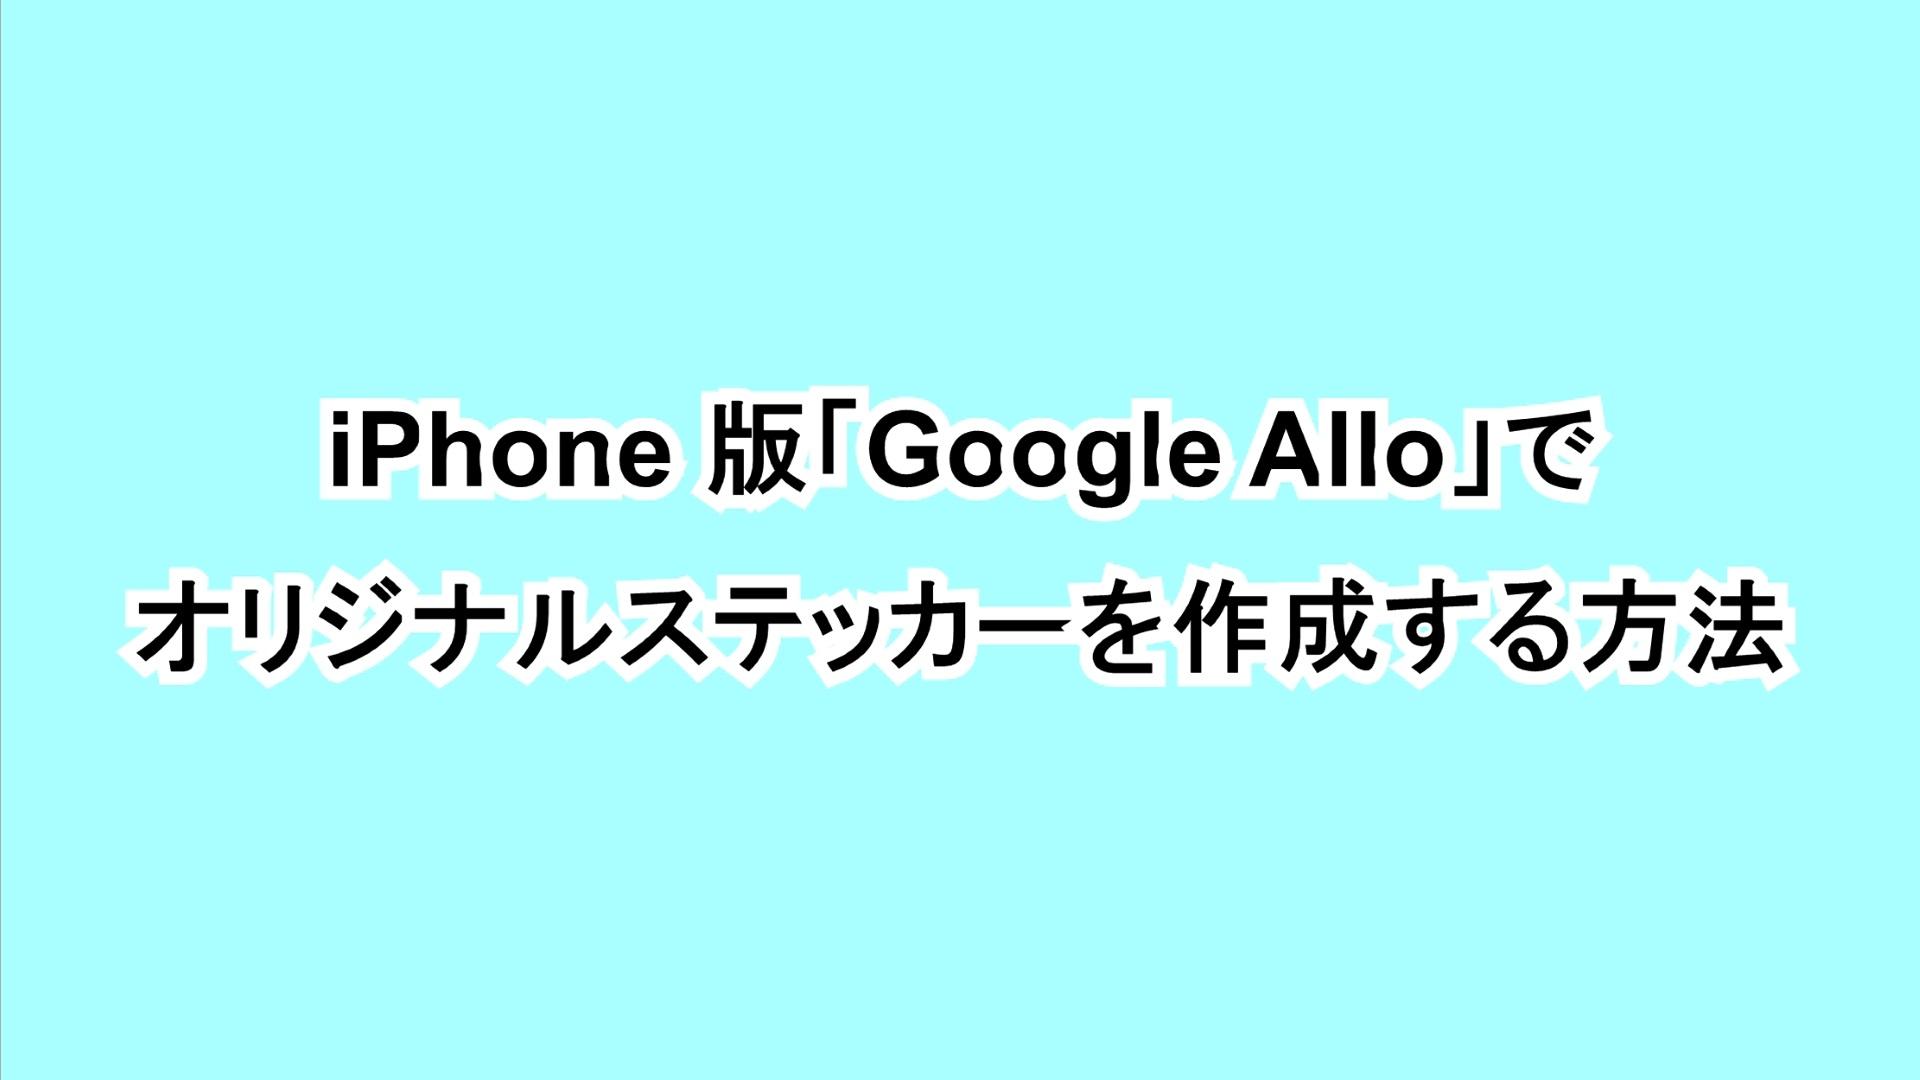 iPhone版「Google Allo」でオリジナルステッカーを作成する方法